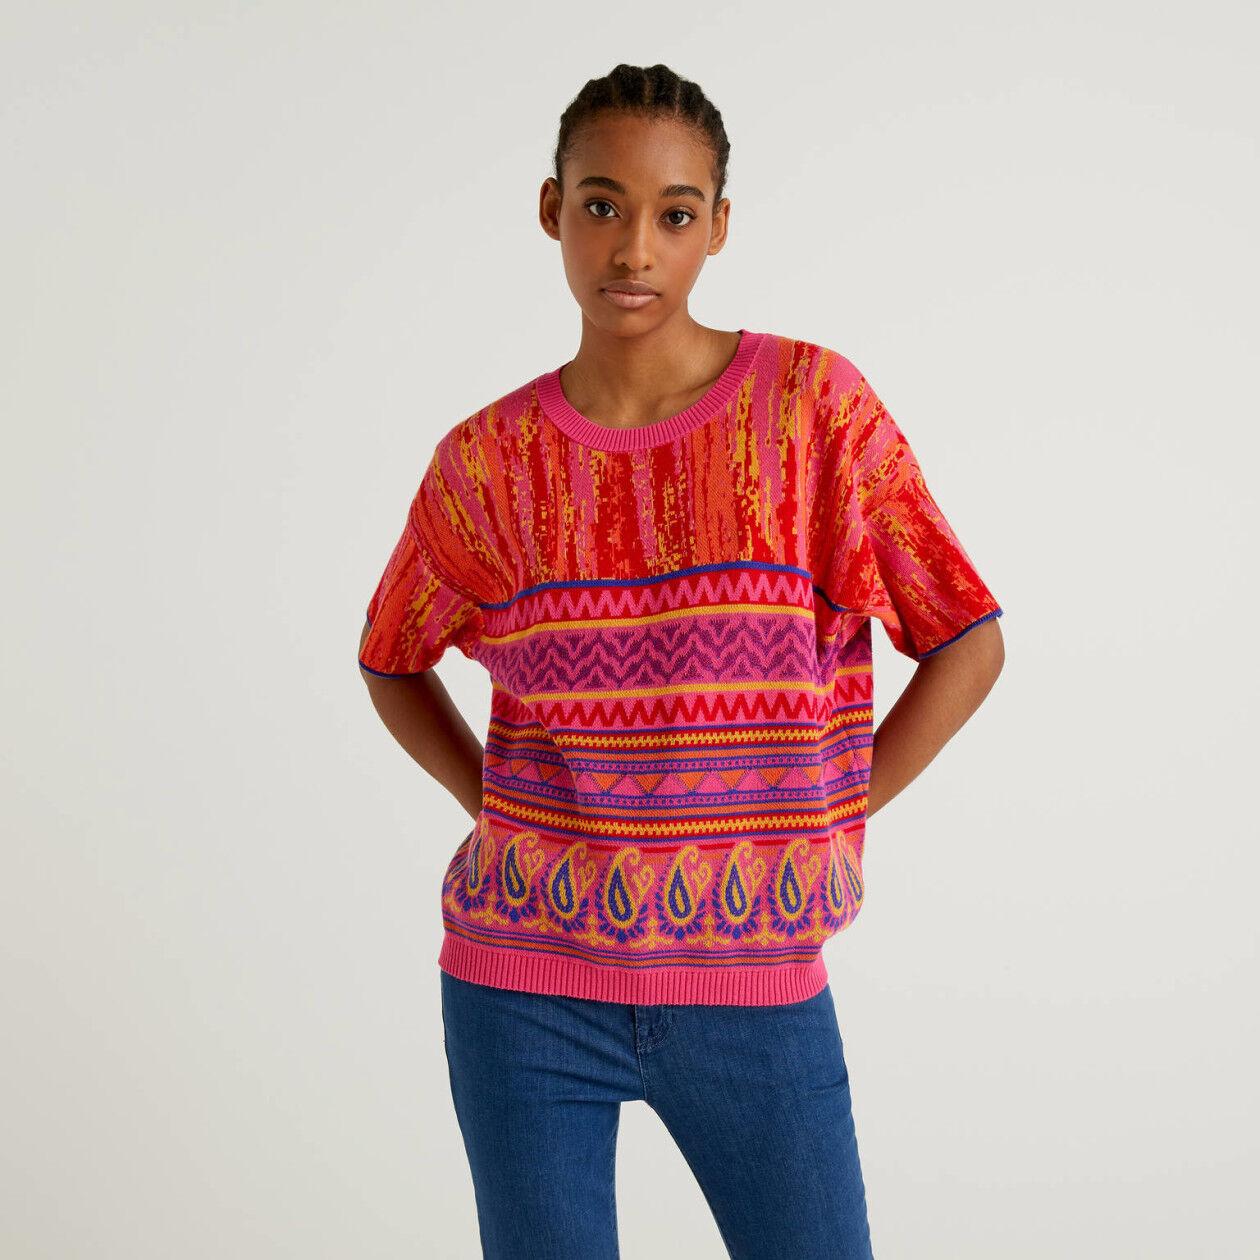 Sweater with multicolor design